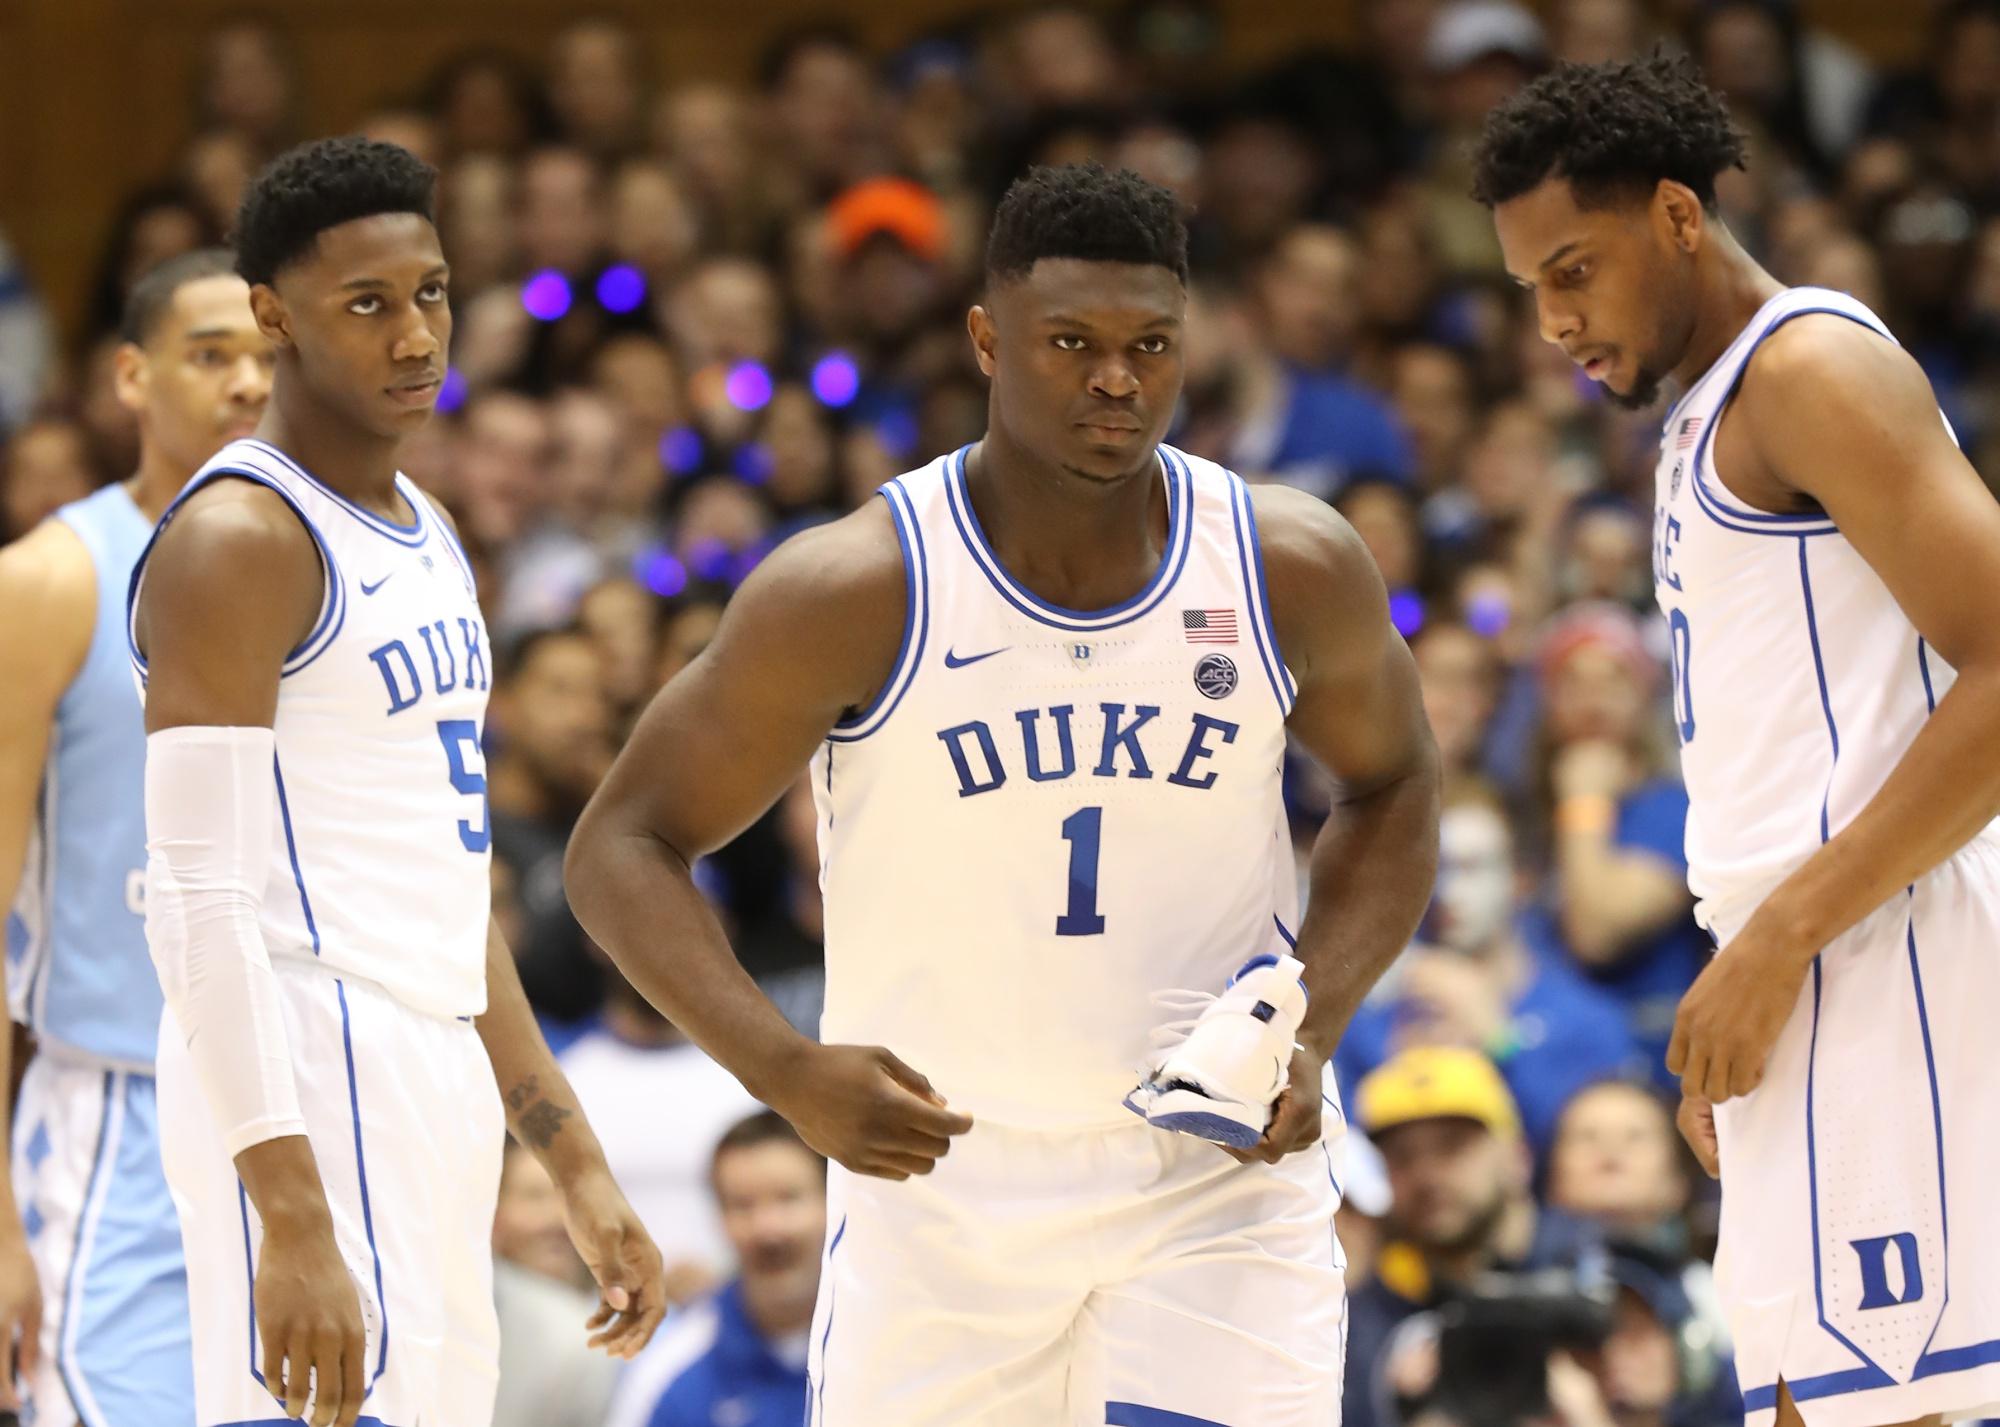 Chaise longue Efectivamente estudio  Broken Nike Basketball Shoe Could Be Product Liability Case